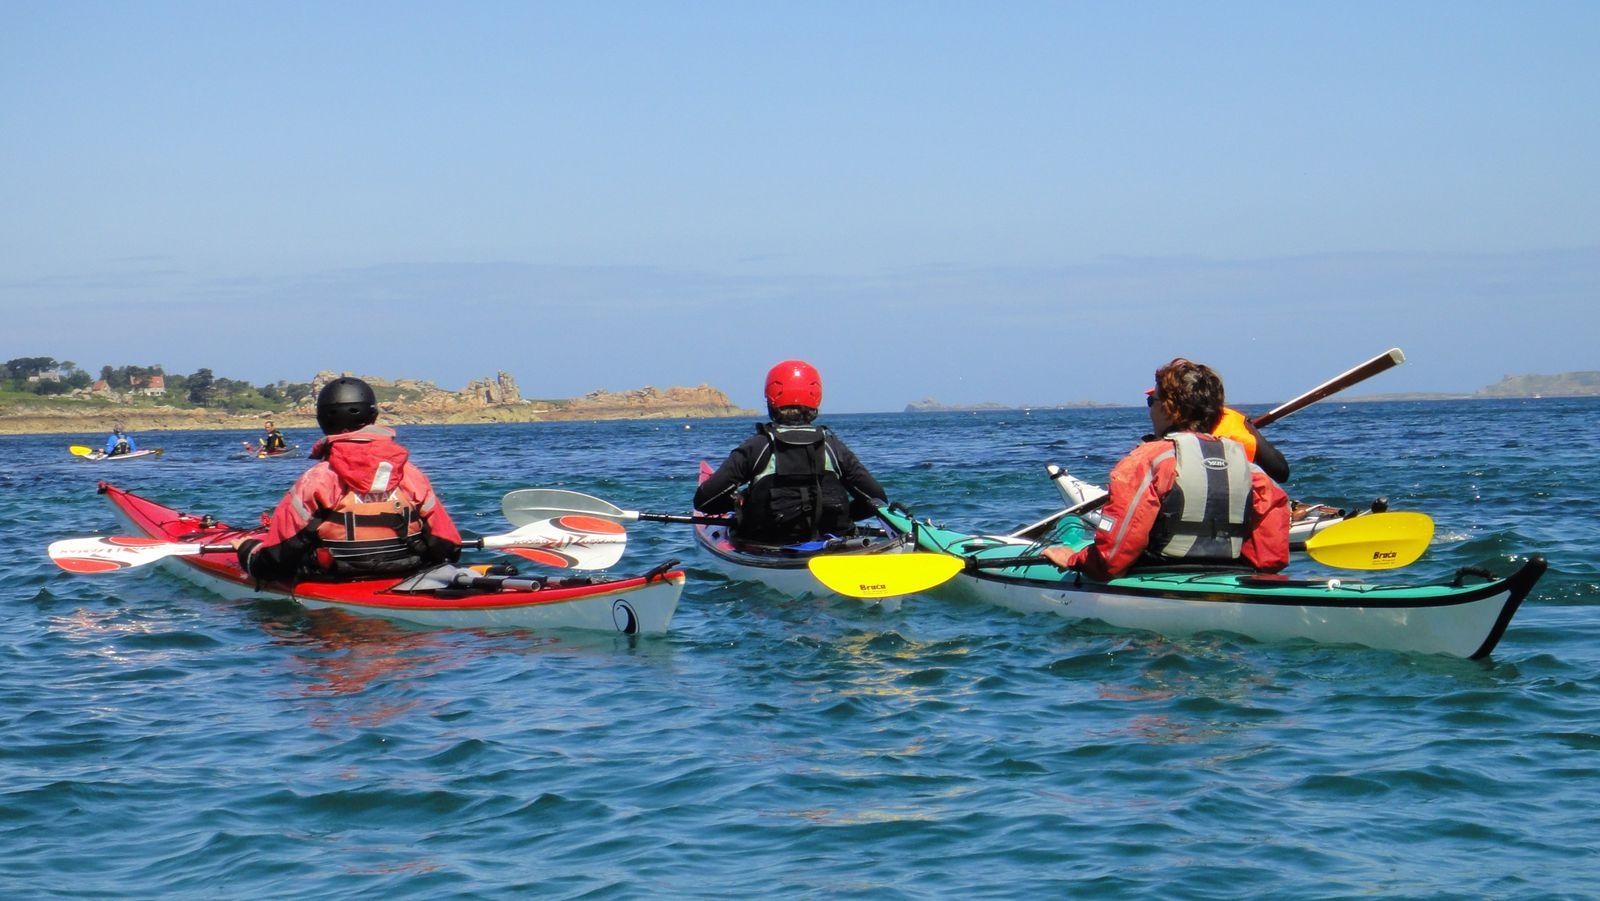 Rando kayak de Trestignel (Perros-Guirec) au phare de Mean Ruz (22)  - Dimanche 1er juillet 2012